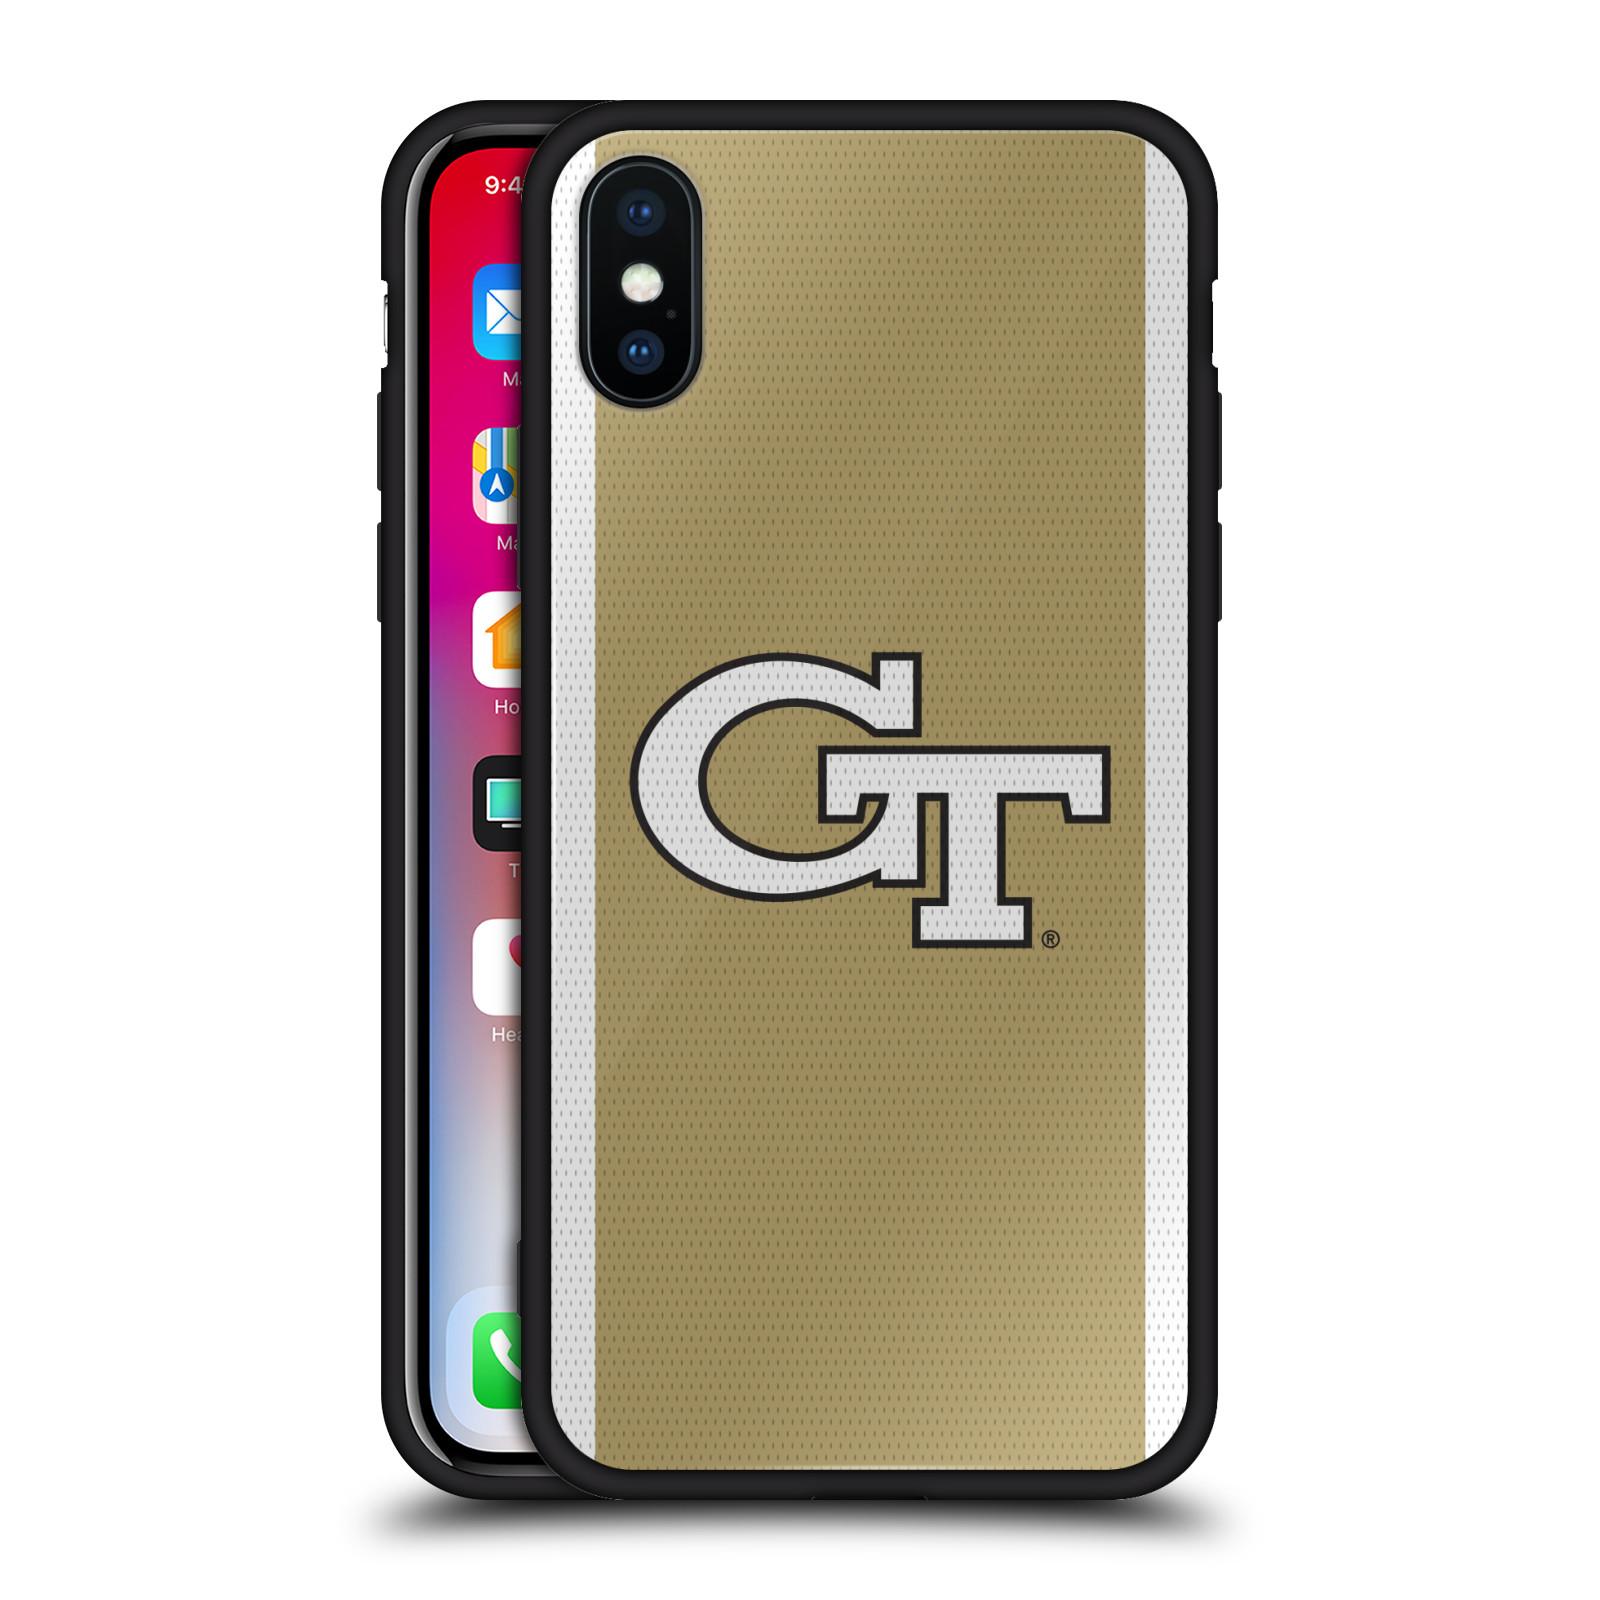 Georgia-Institute-of-Technology-negra-hibrida-de-cristal-nuevo-caso-para-telefonos-iPhone